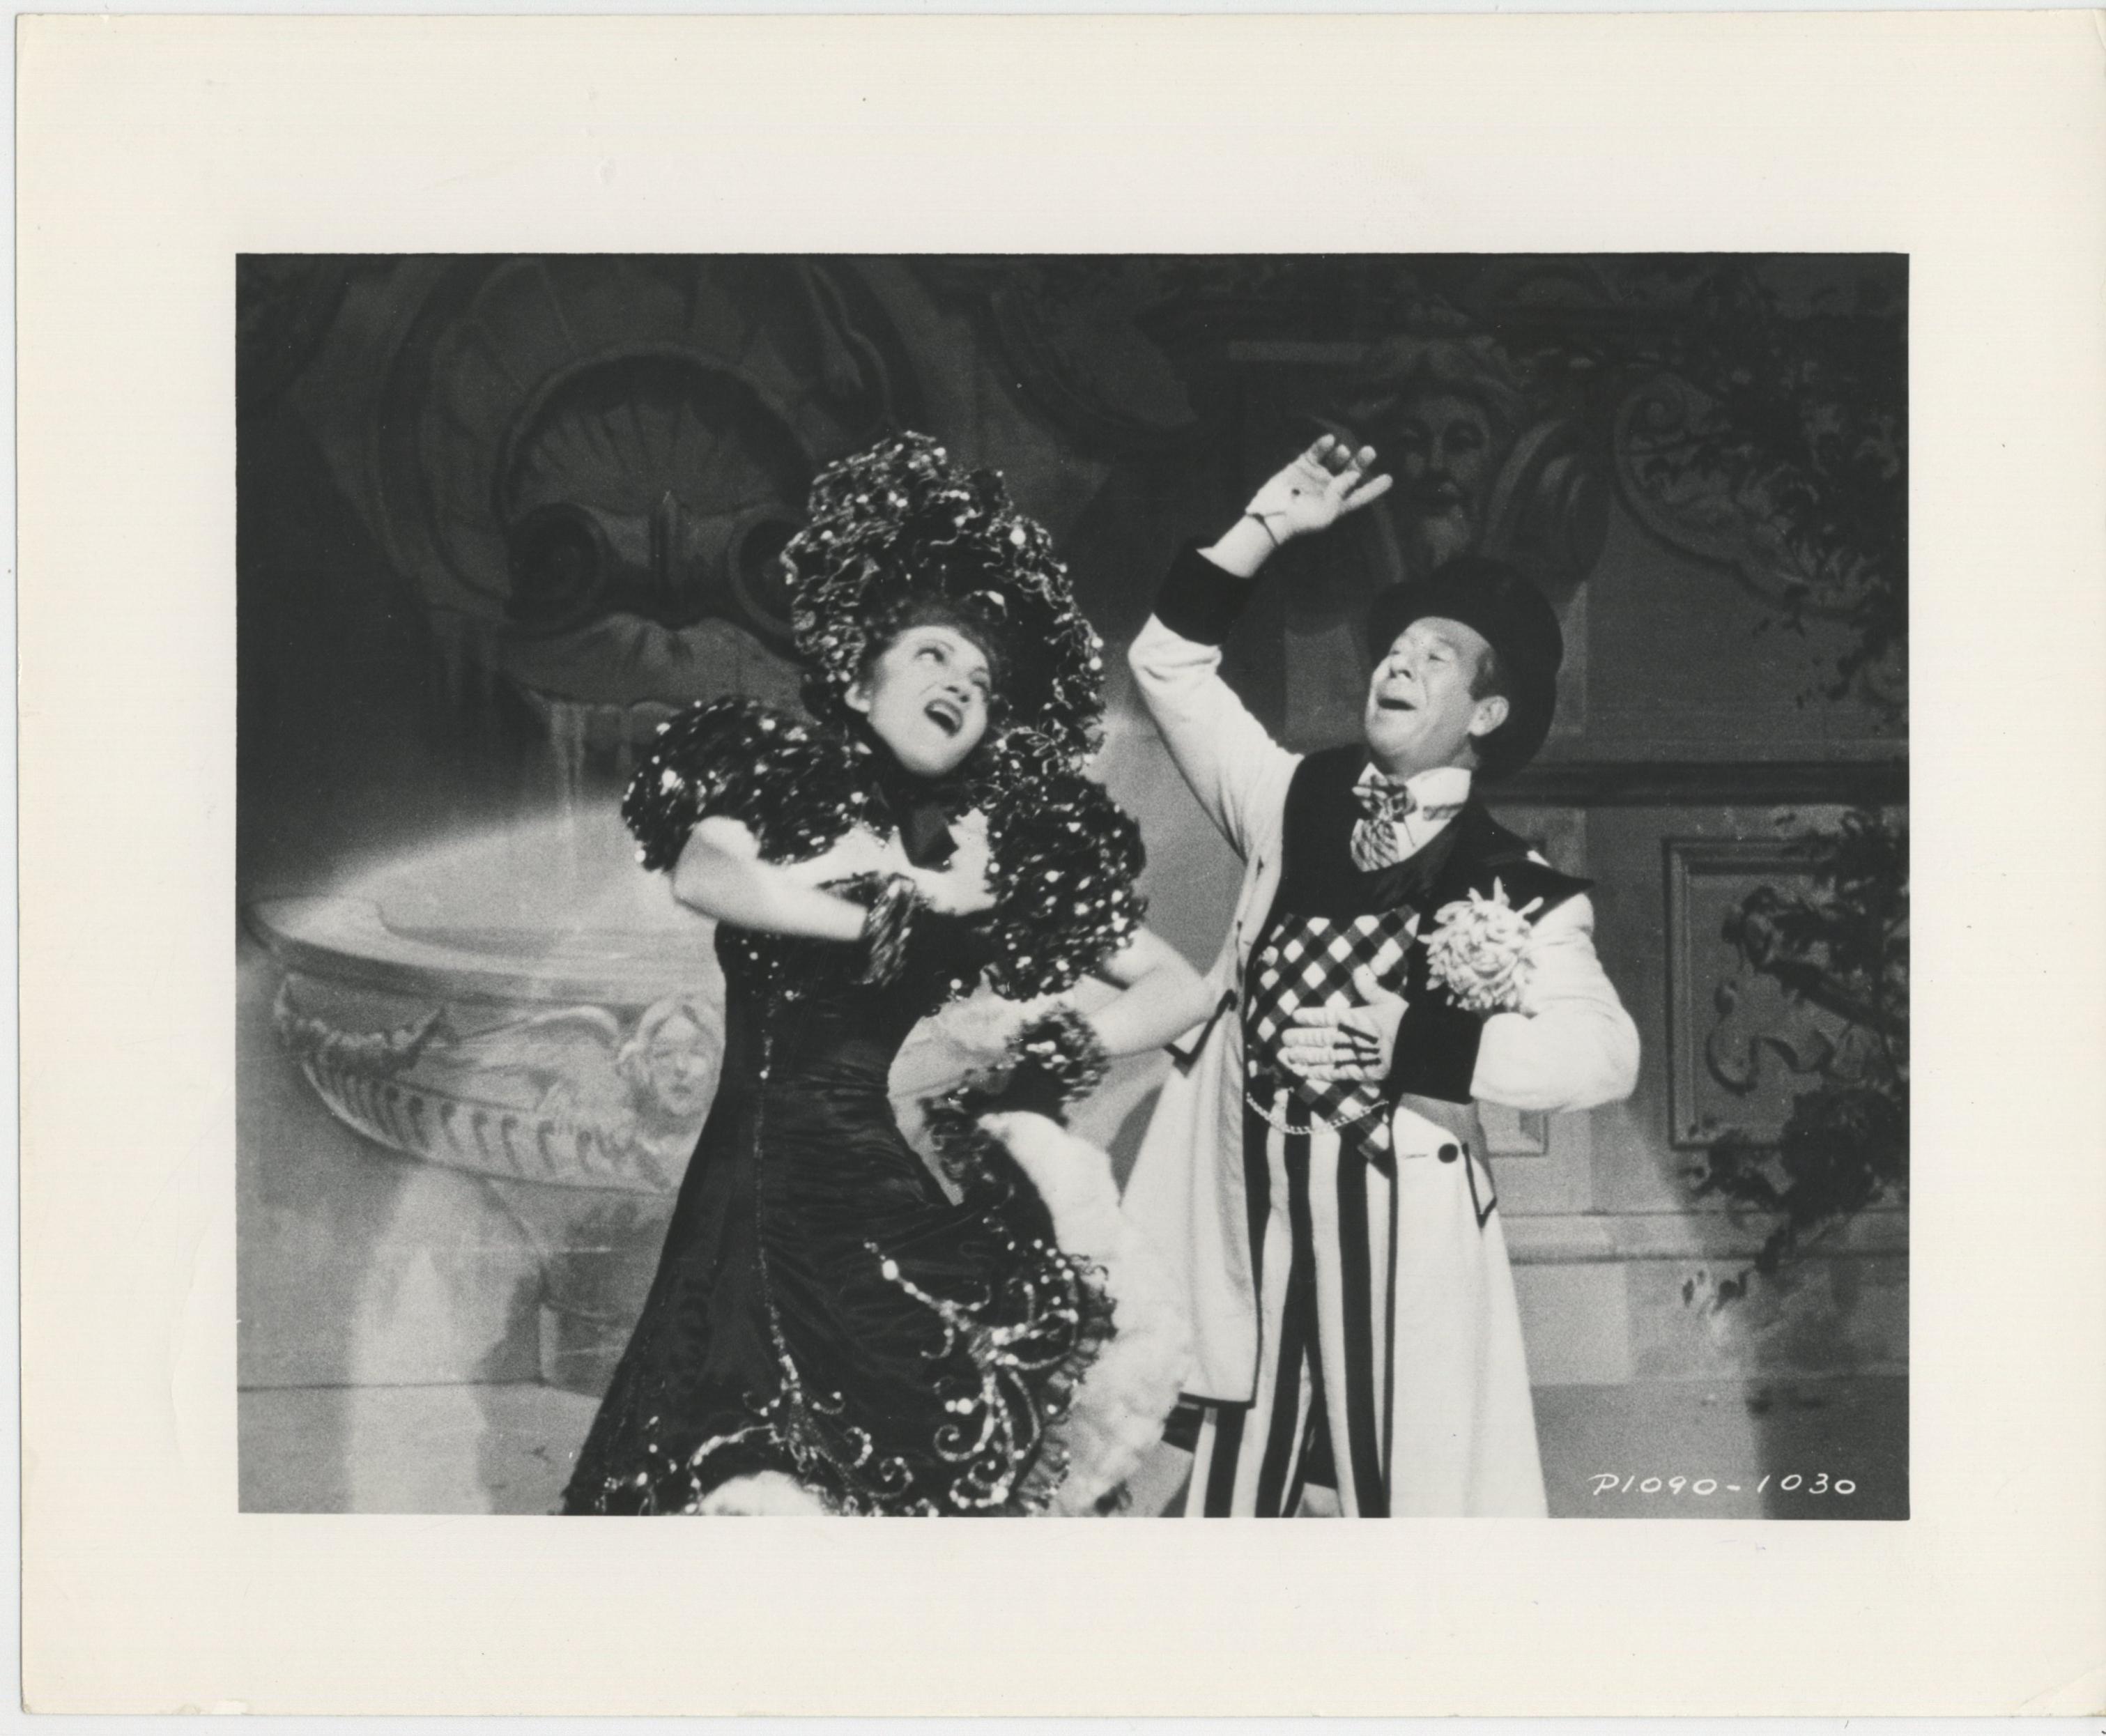 Claudette Colbert and Bert Lahr in Zaza (1938)